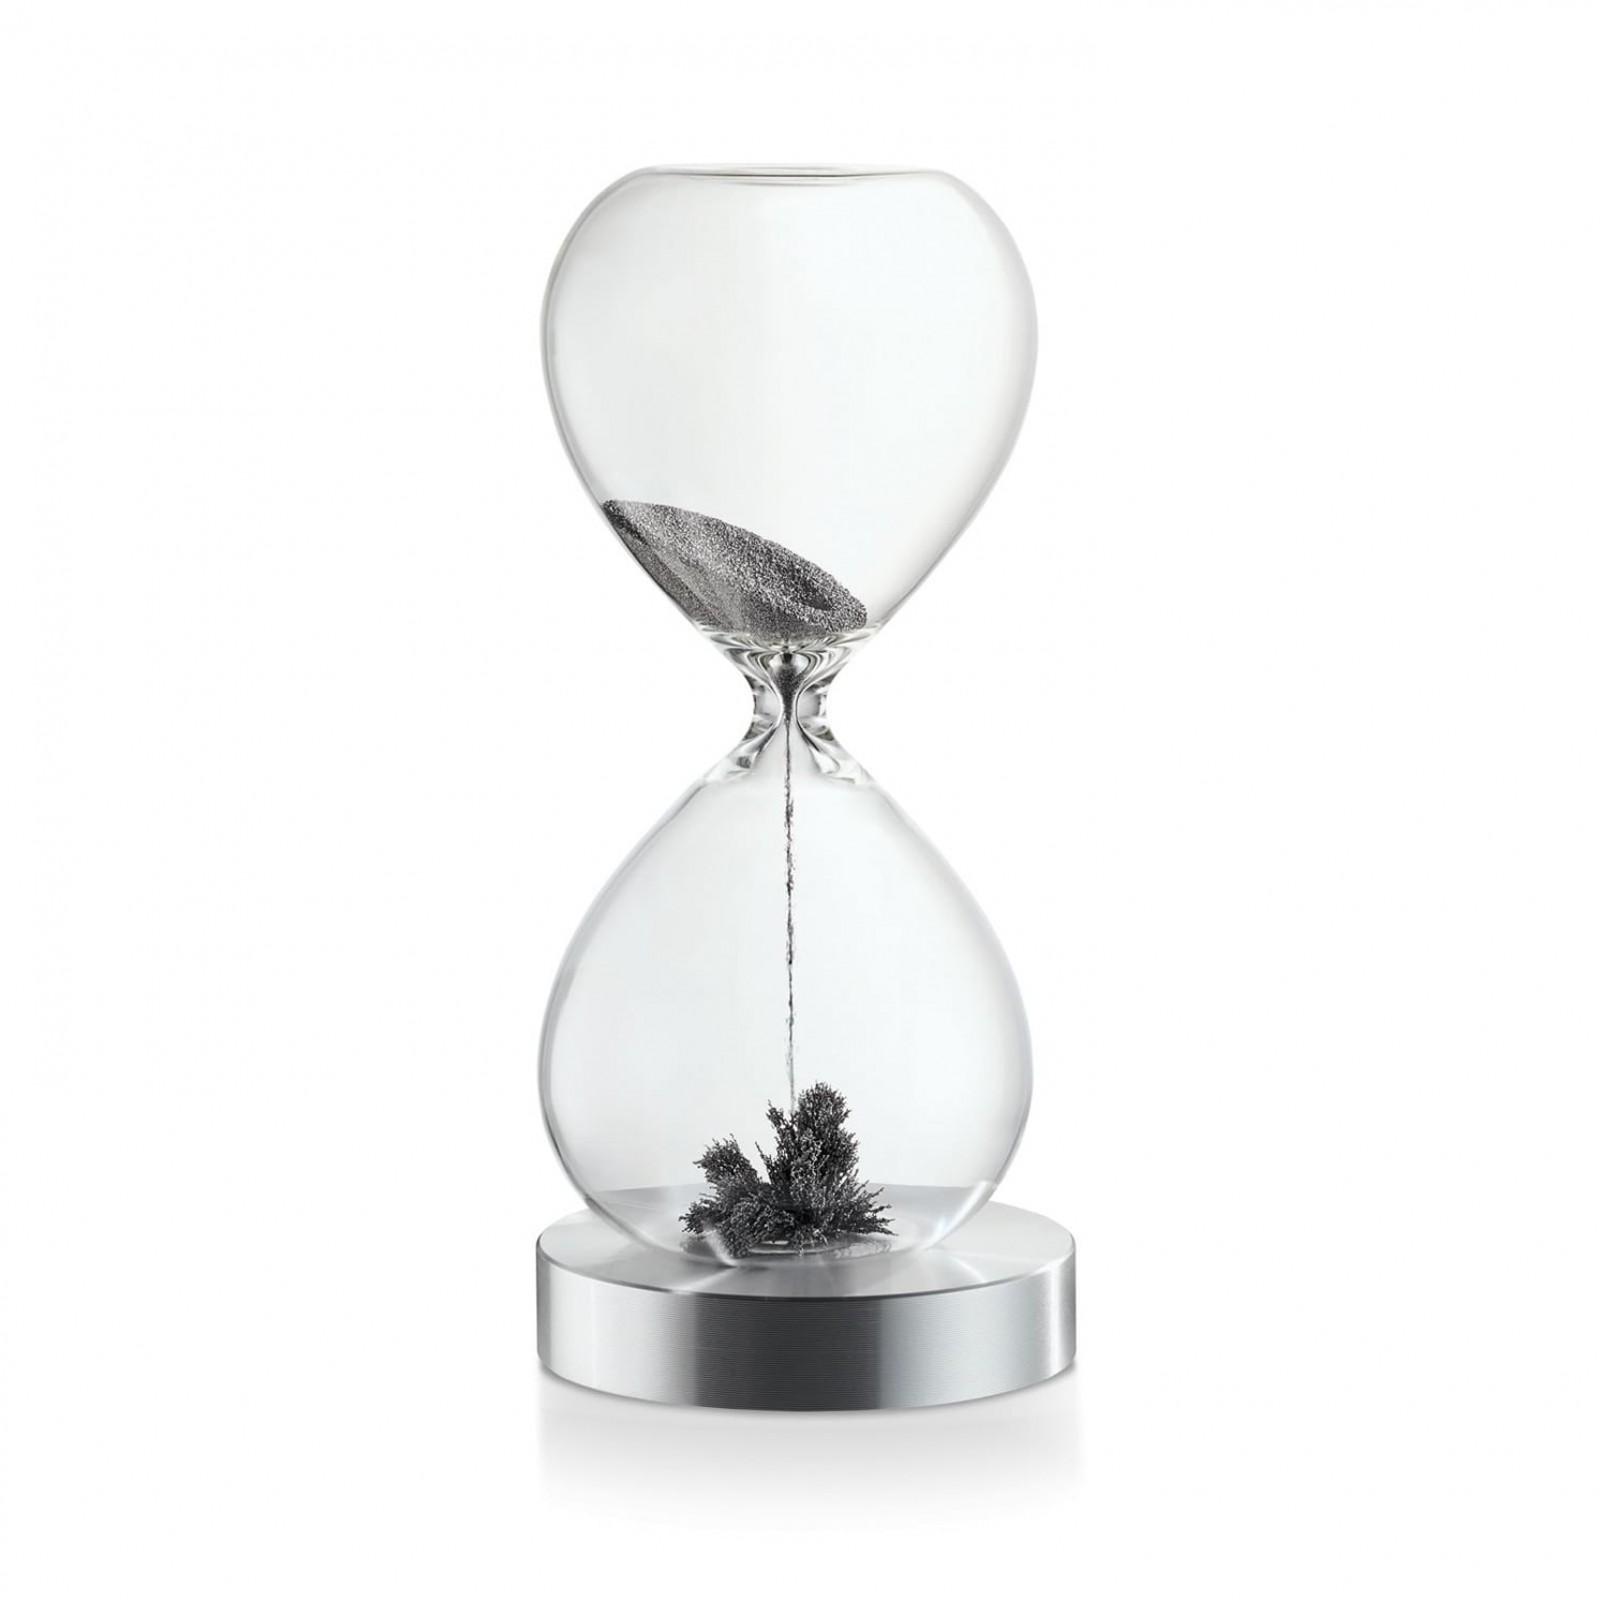 LALA MIND PAUSER Hourglass - Philippi